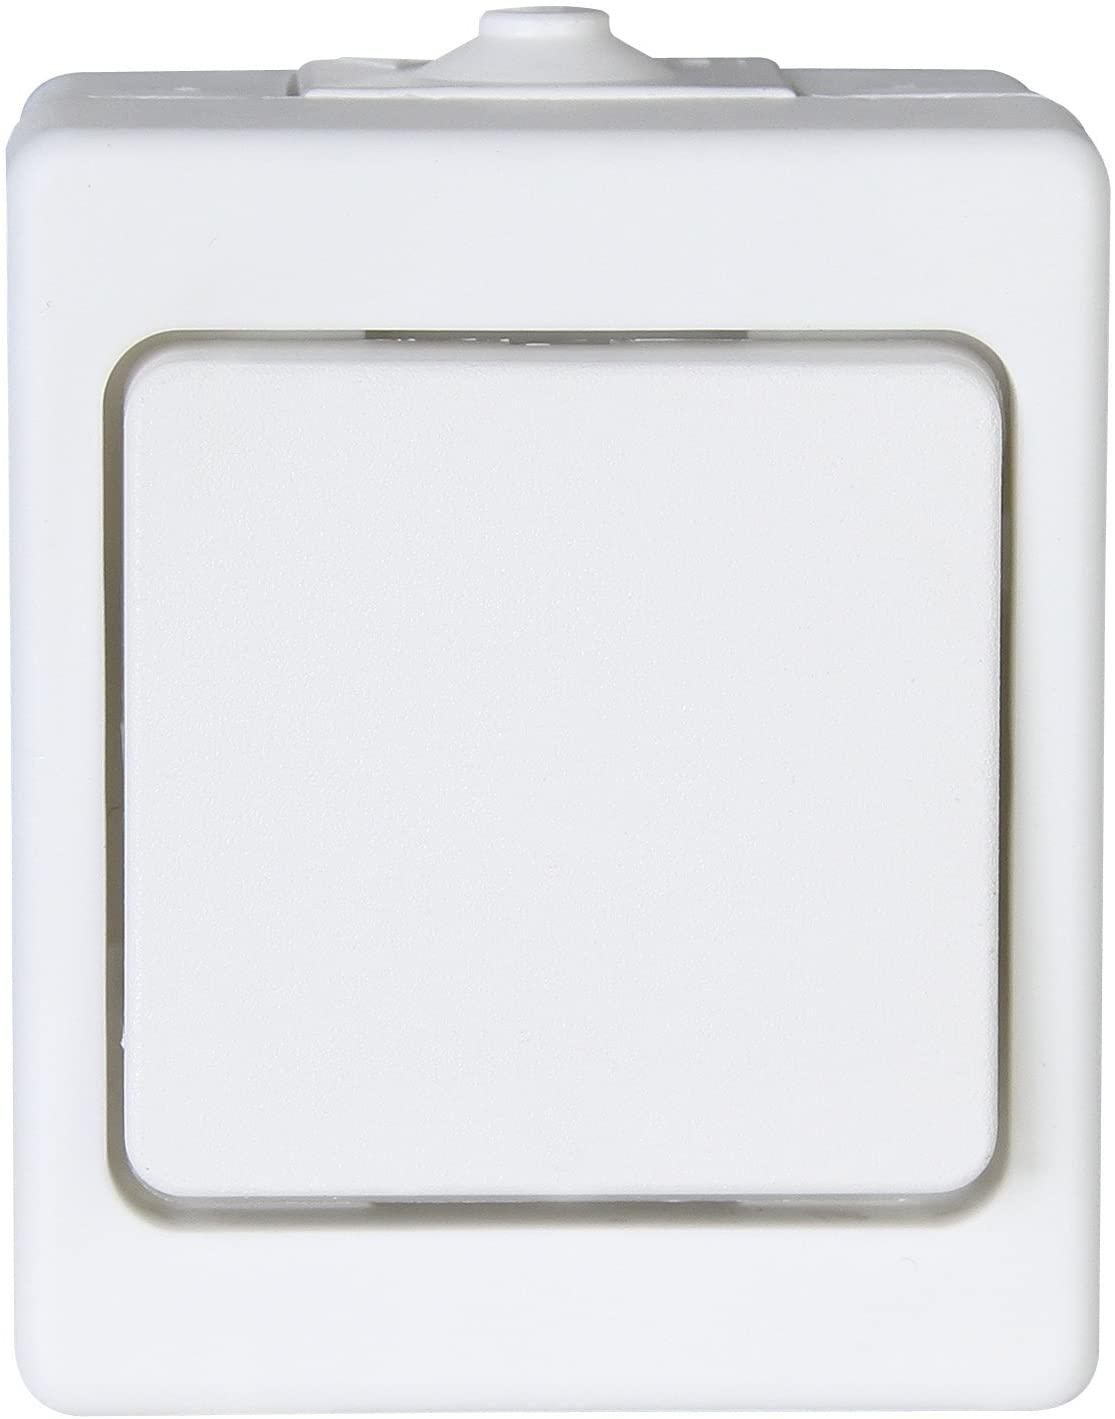 Cogenerationhave 564302002 Finery-Moisture-Proof Caliper, IP44, Standard